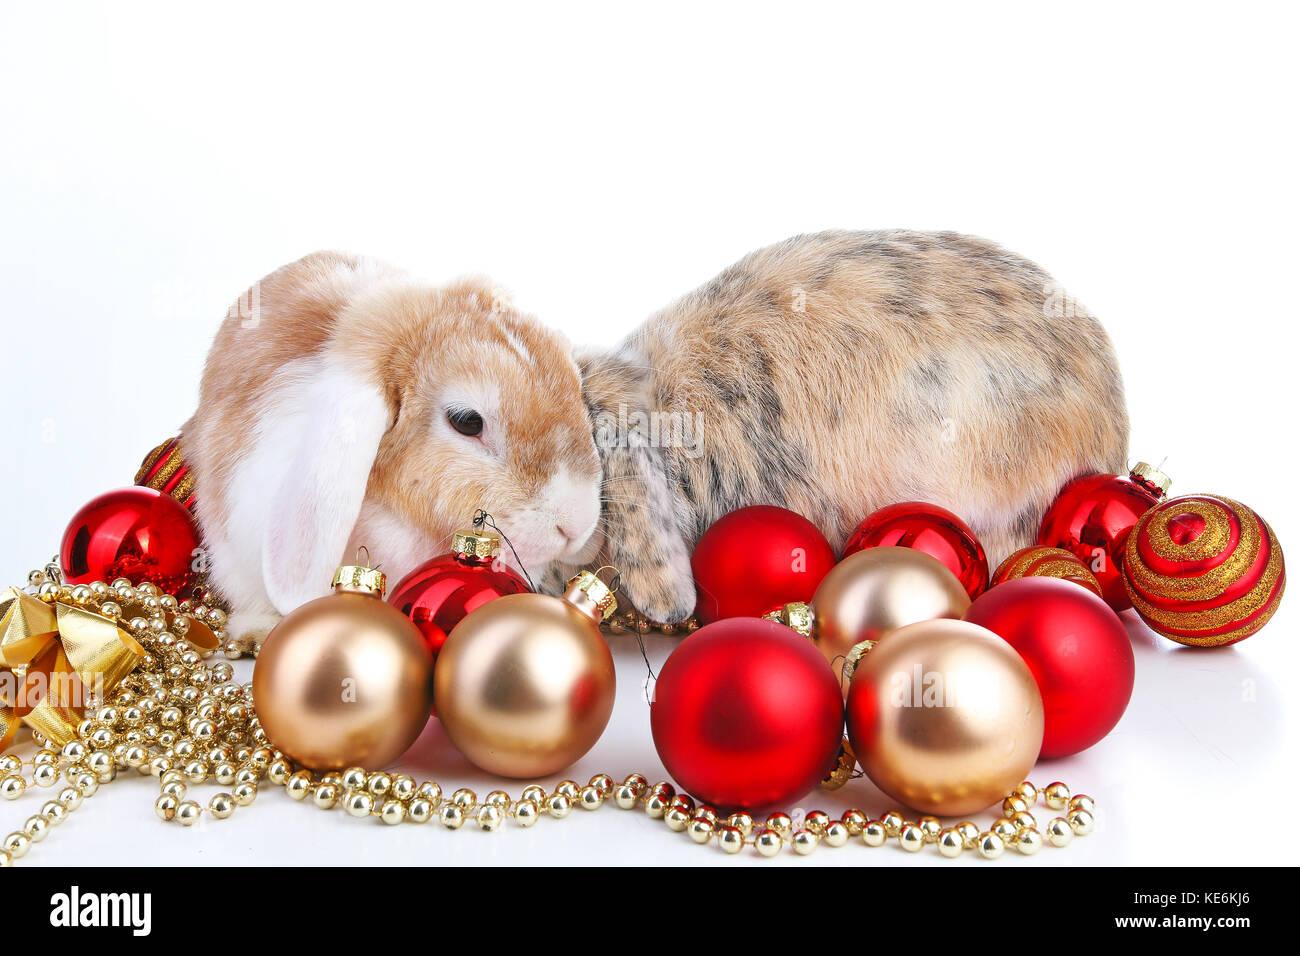 Christmas Animals Cut Lop Eared Rabbit Pet Friends On